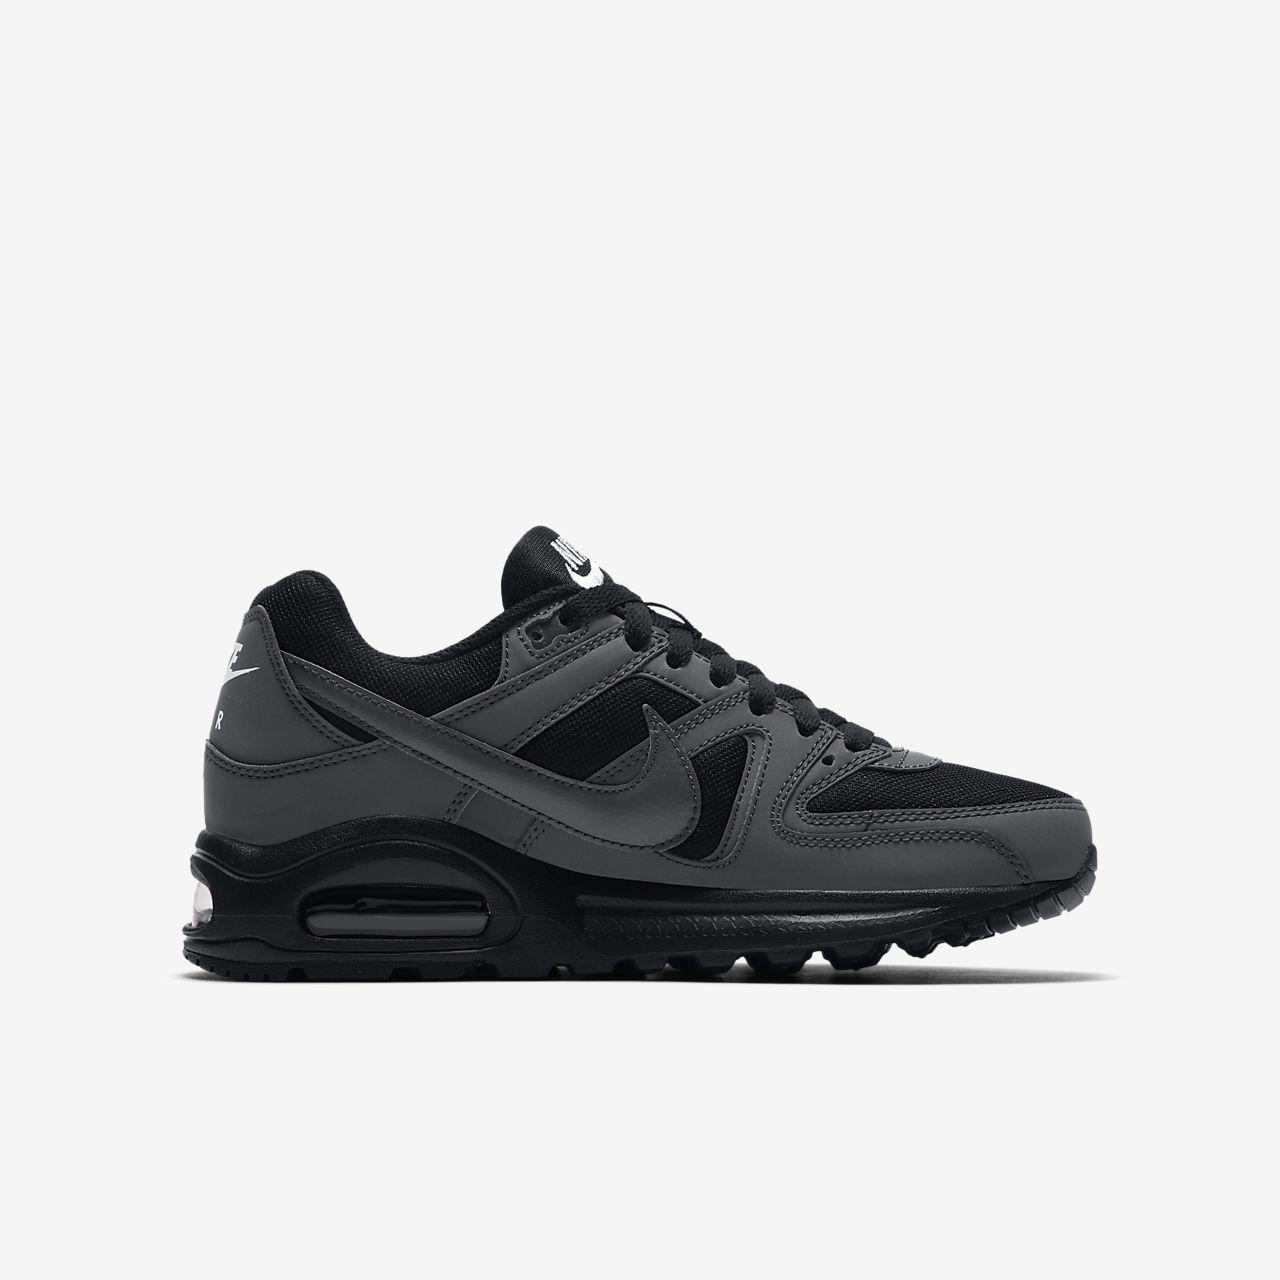 hot sale online a2c53 fbd6f ... Nike Air Max Command Flex Schuh für jüngere Kinder